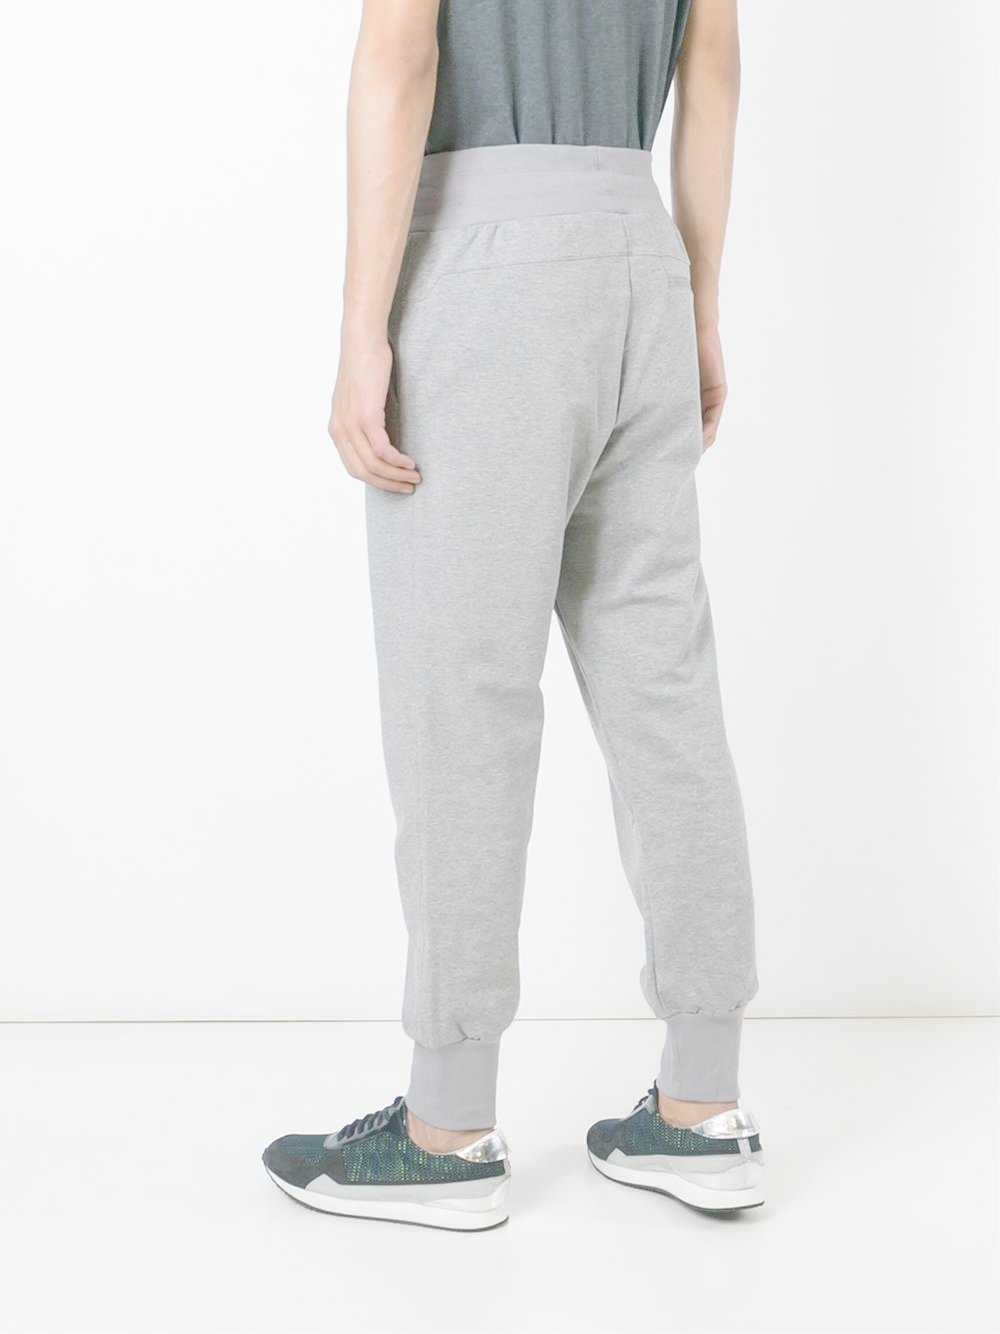 adidas Originals Cotton 'porsche Design Sports' Sweatpants in Grey (Grey) for Men